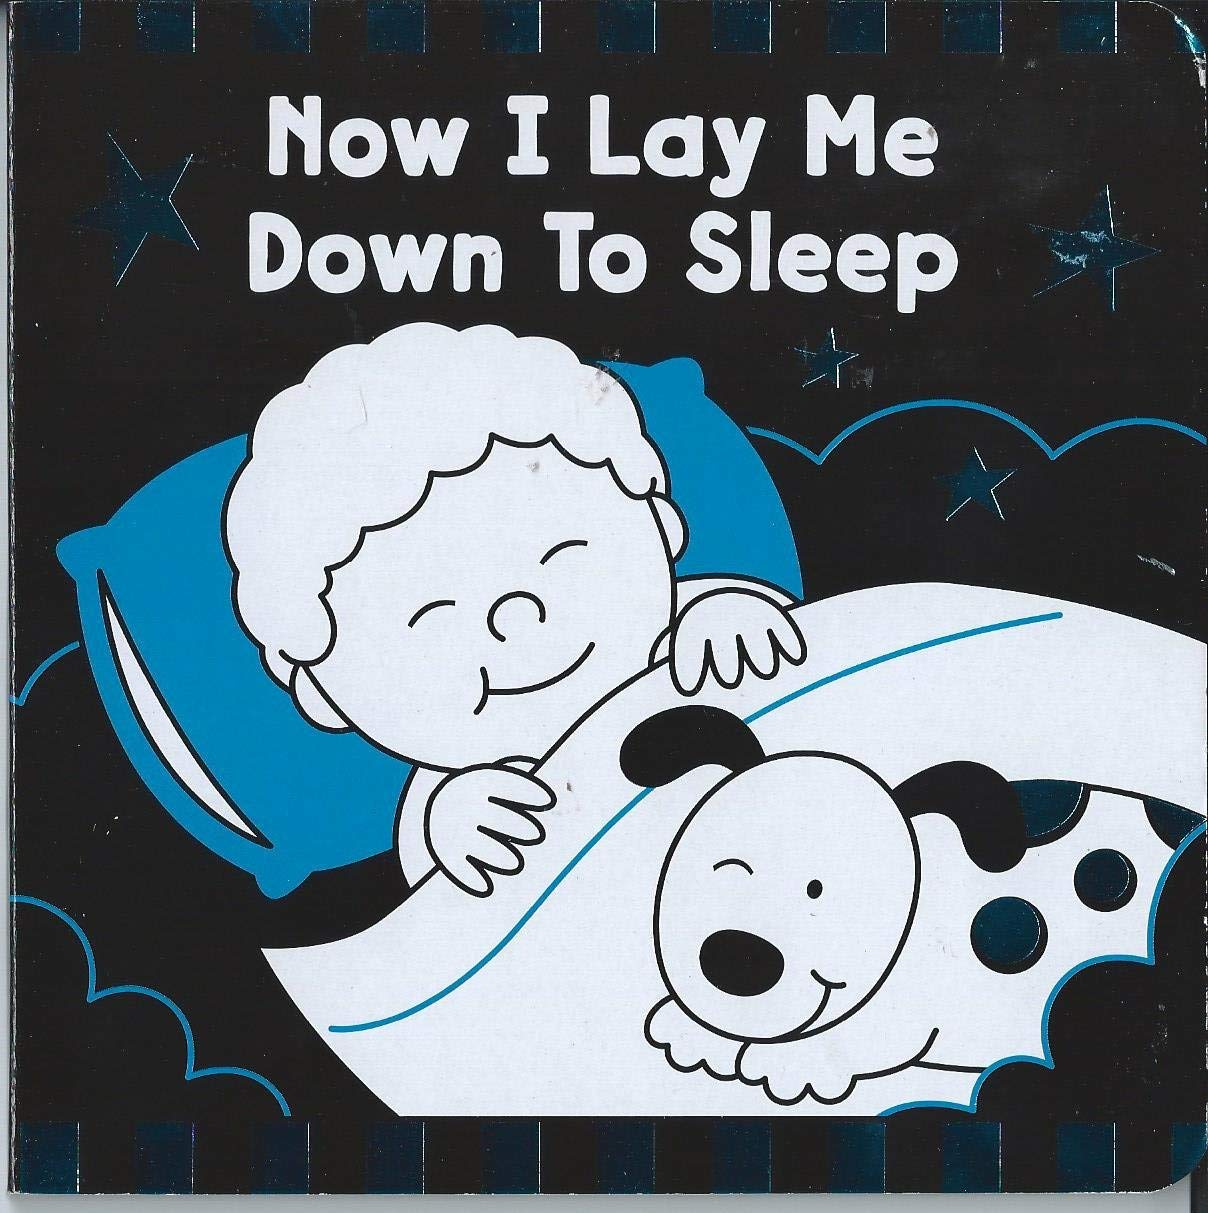 God Made Me!/Thank You God!/Now I Lay Me Down to Sleep ebook